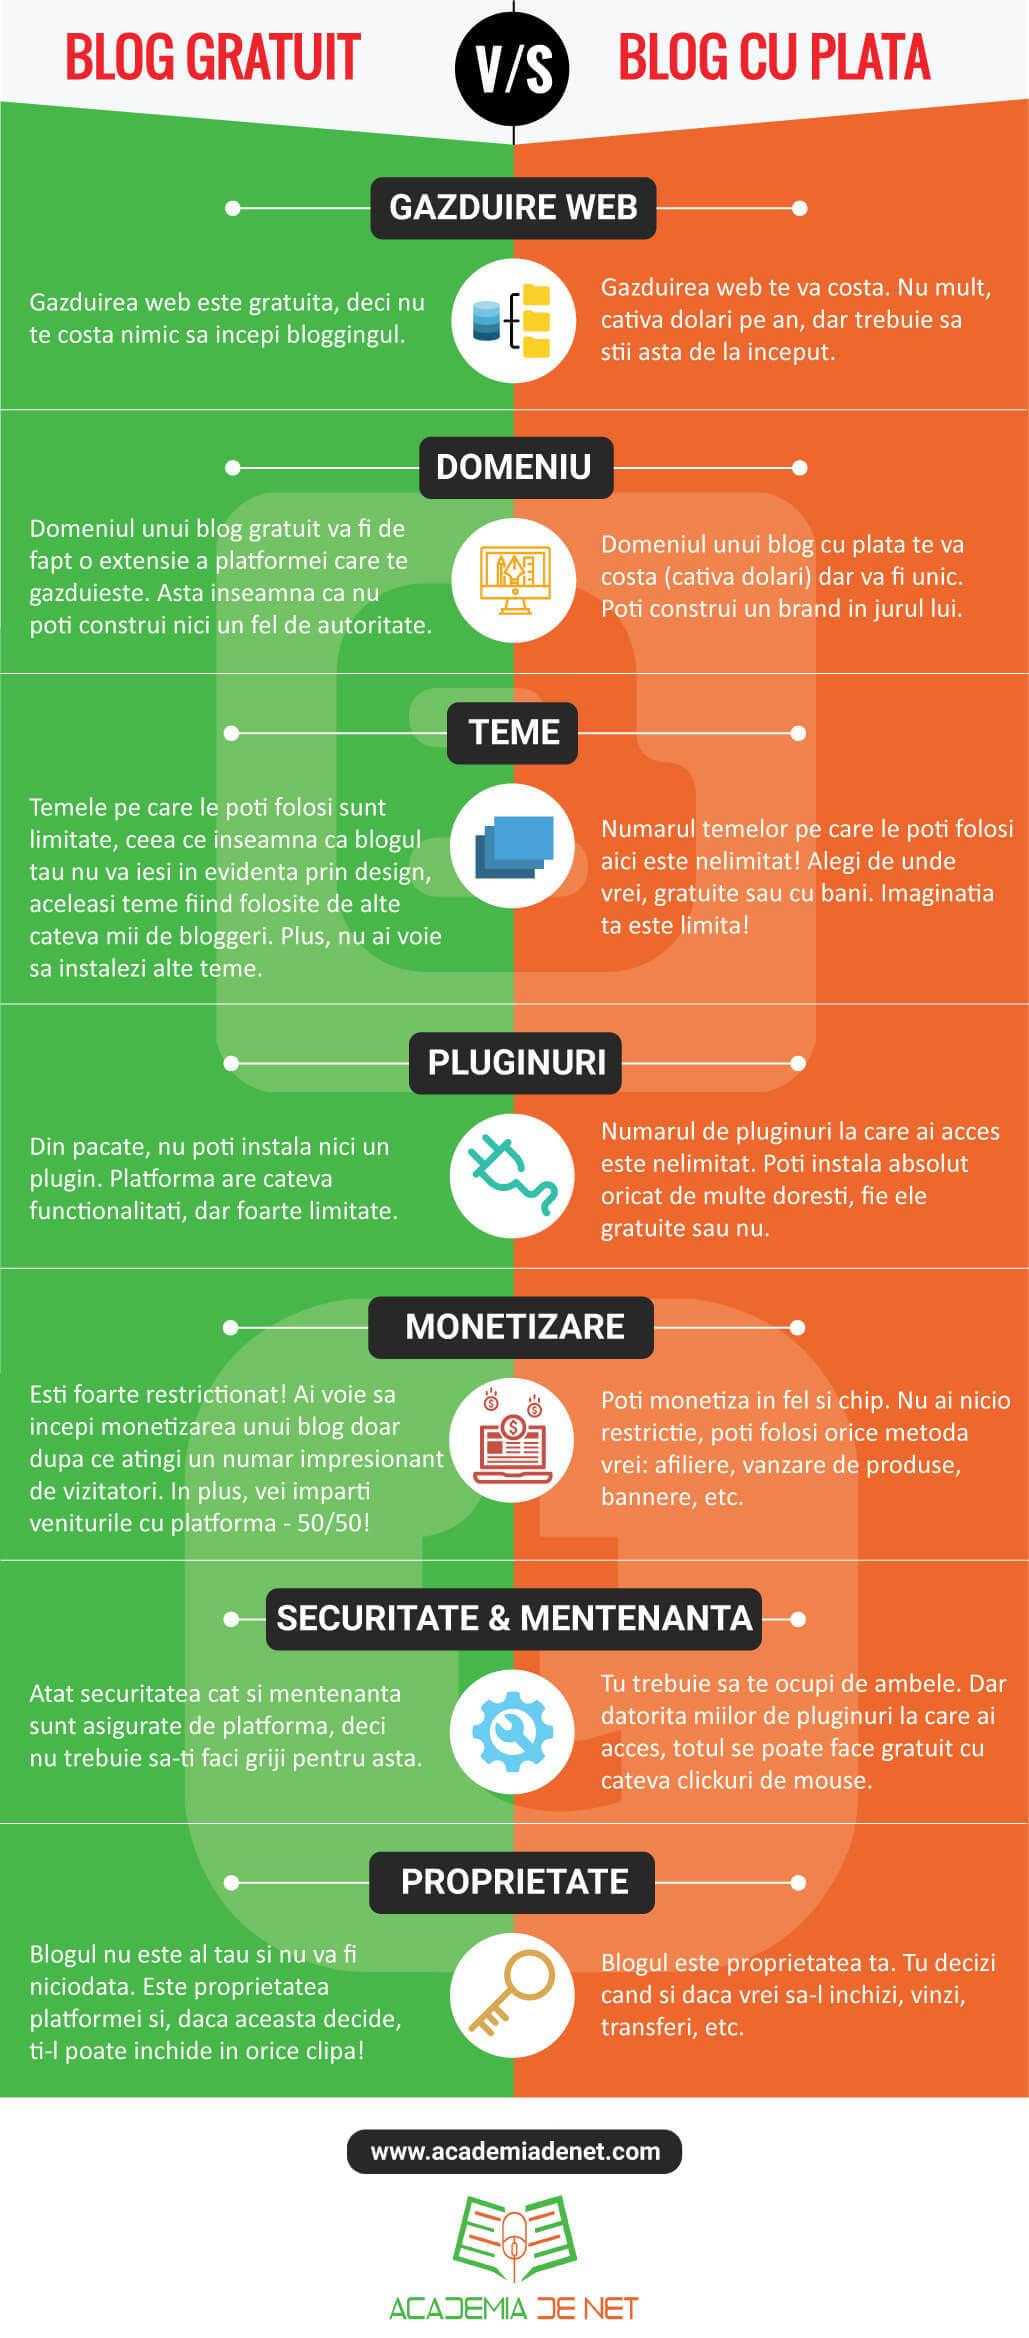 blog gratuit vs blog cu plata infografic